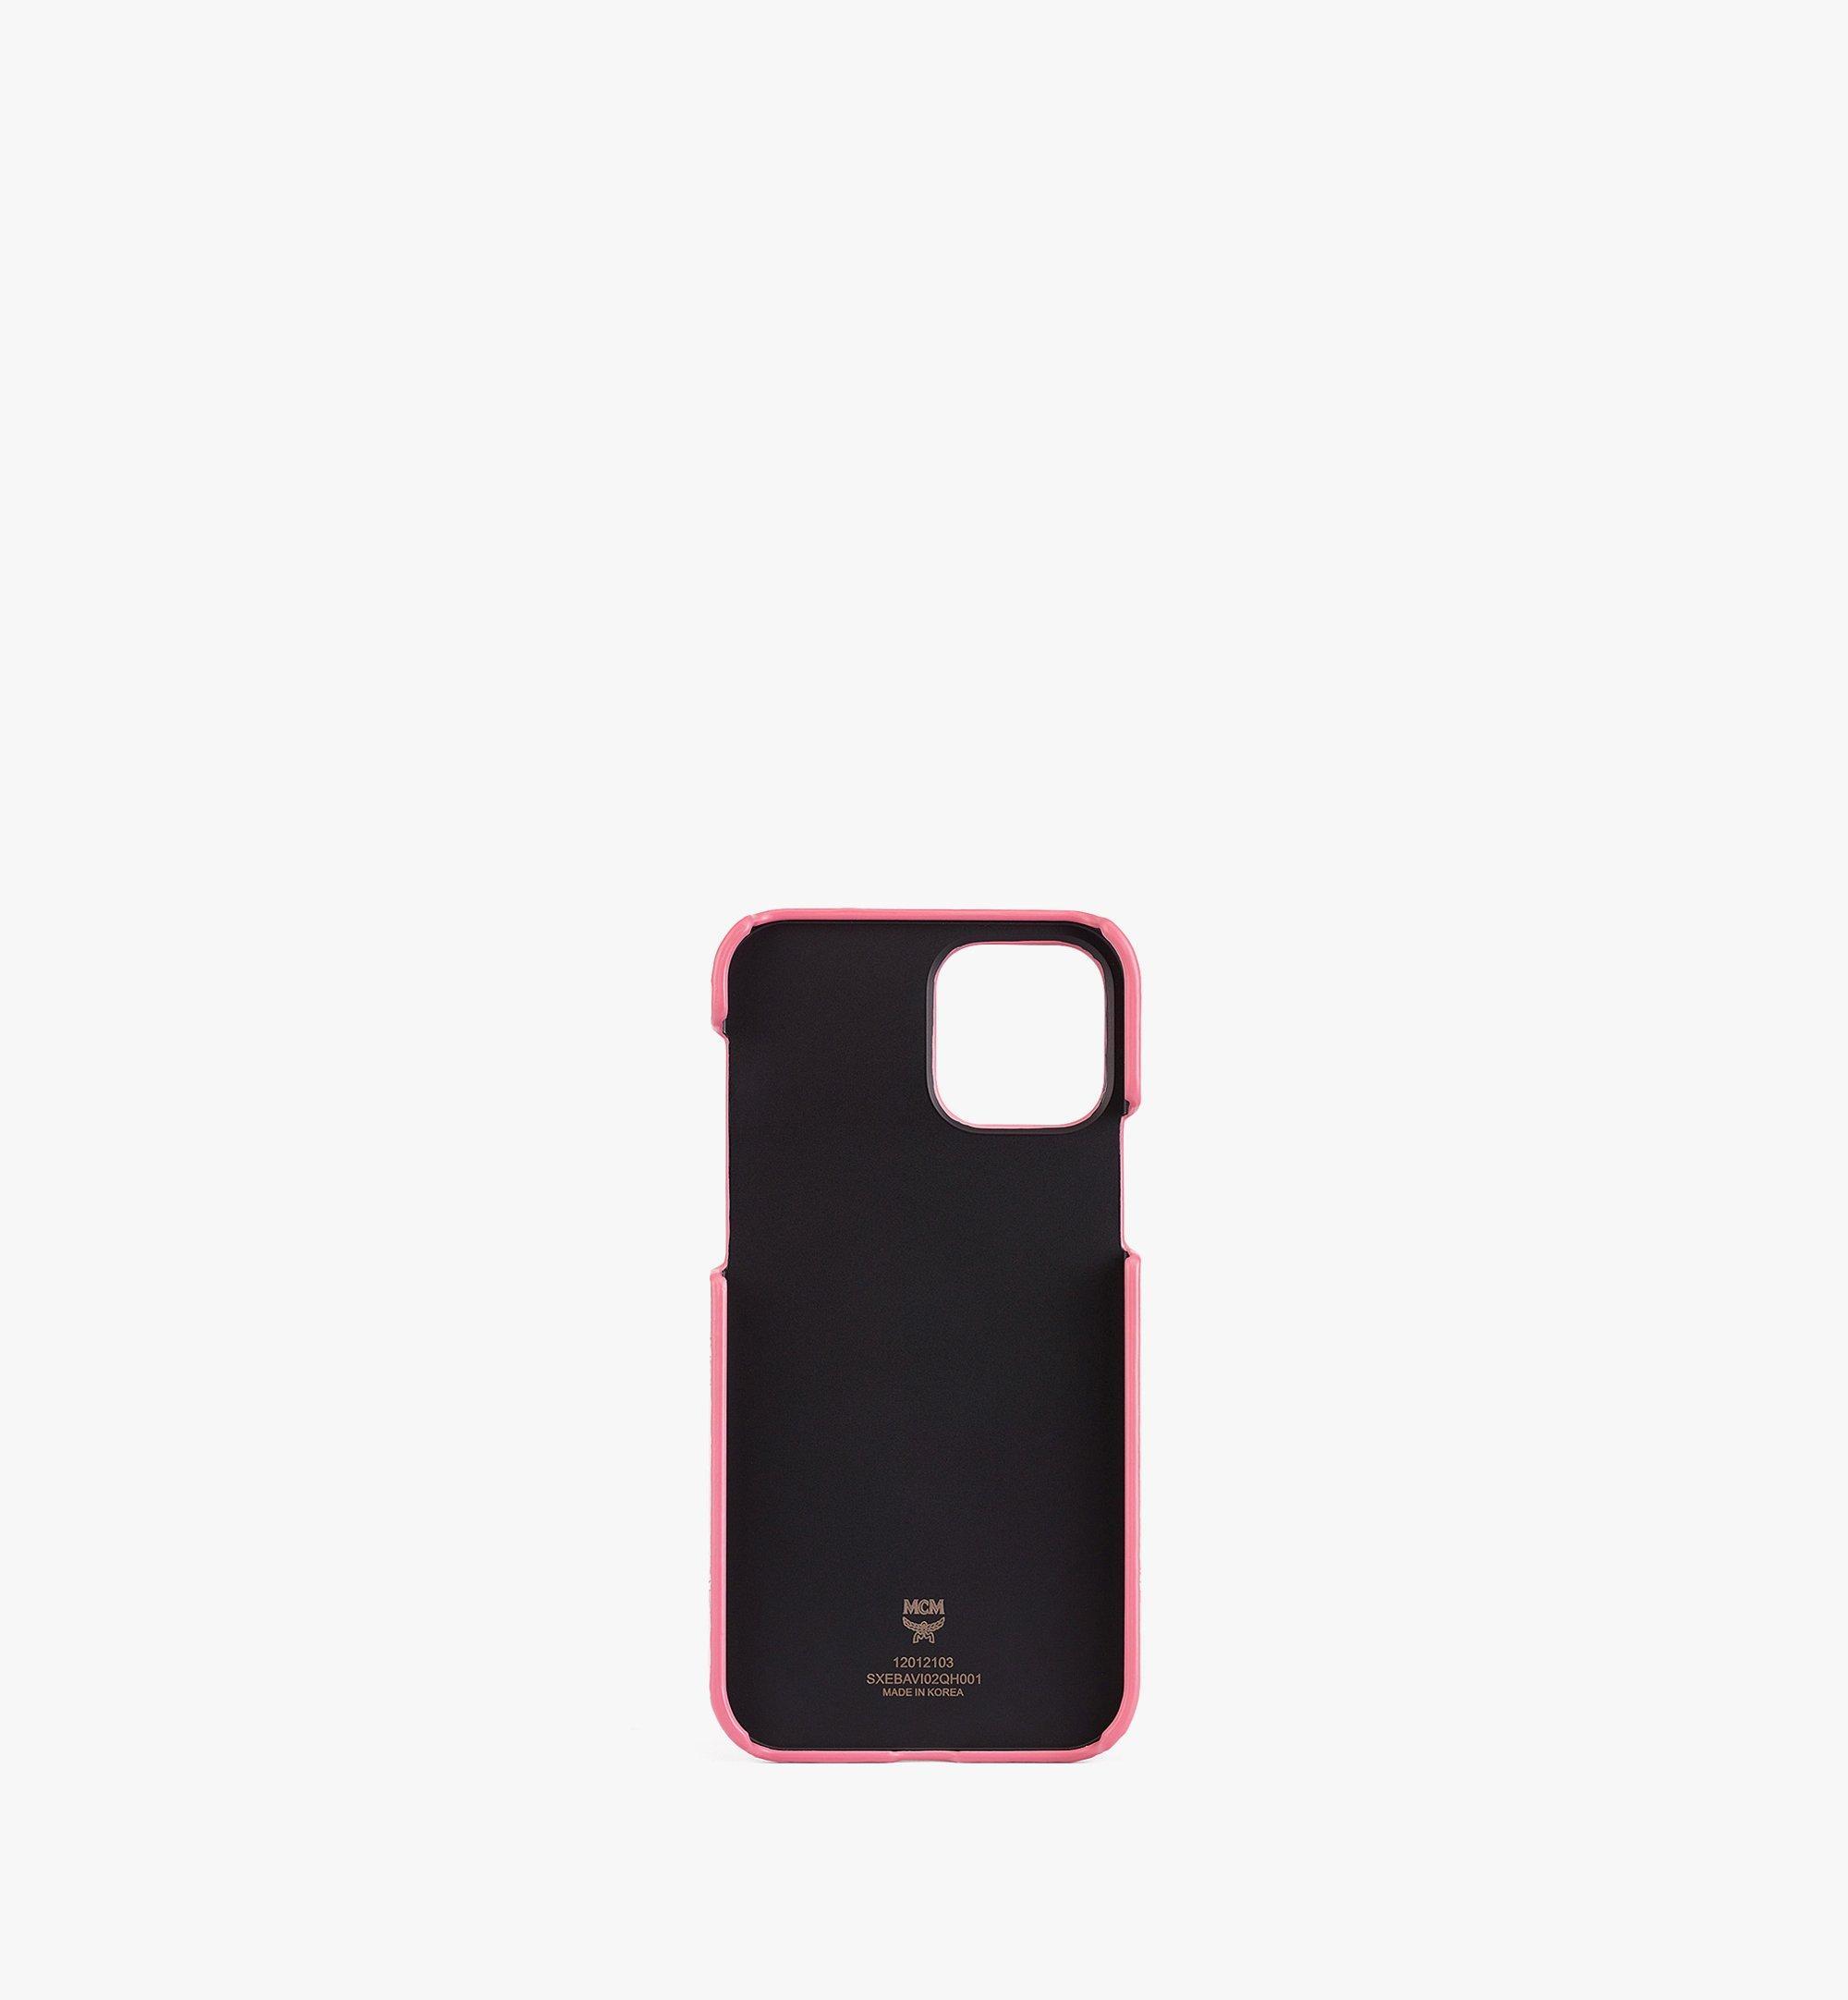 MCM iPhone 12/12 Pro 手機殼附鏈條把手及卡片夾層 Pink MXEBAVI02QH001 更多視圖 1